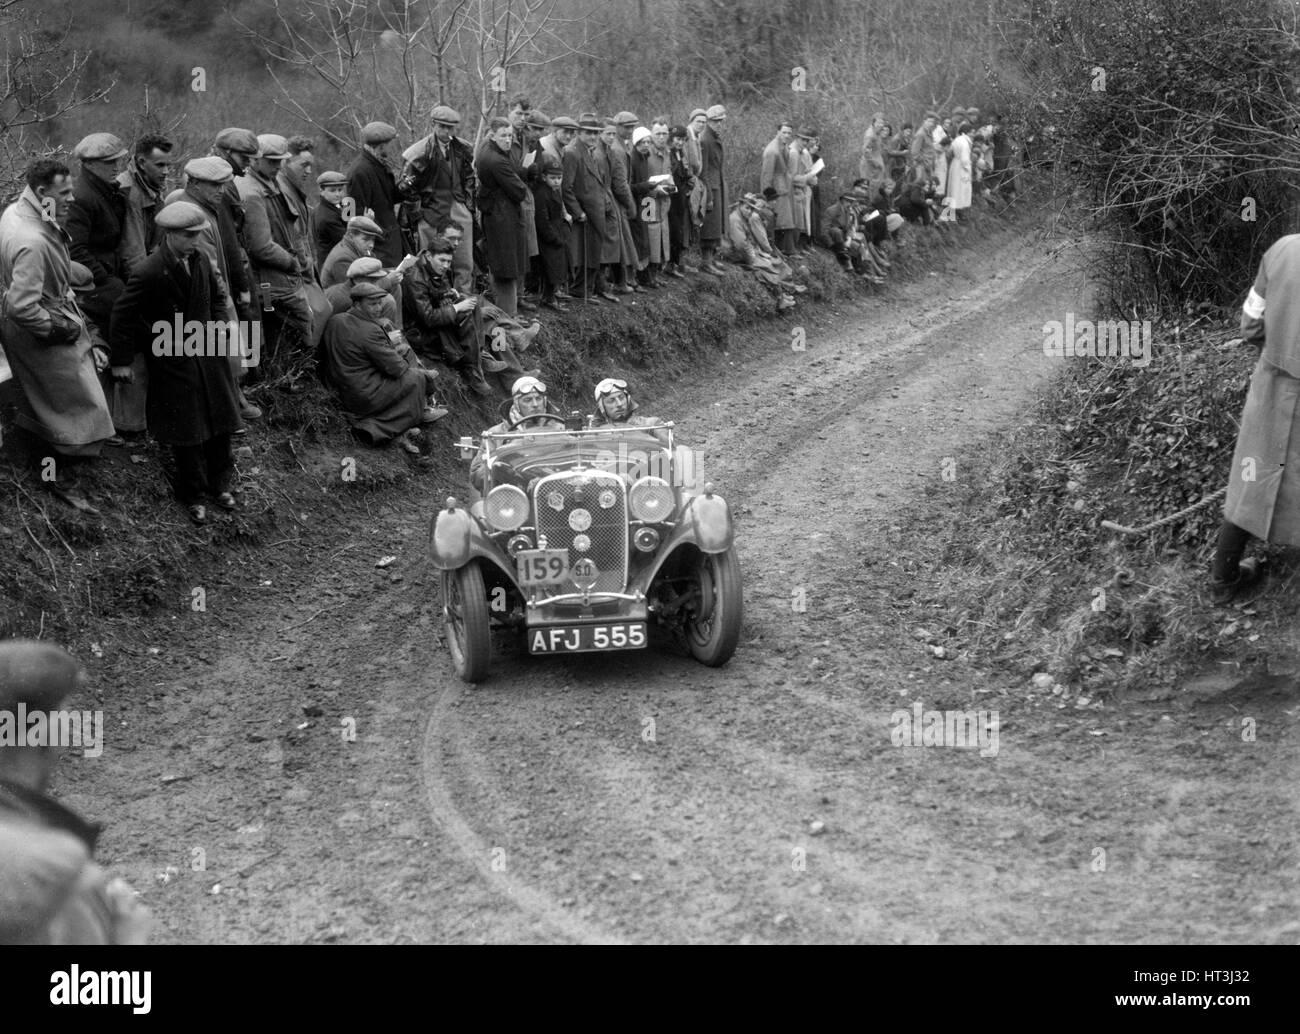 Singer Le Mans of ET Ingham competing in the MCC Lands End Trial, 1935. Artist: Bill Brunell. - Stock Image